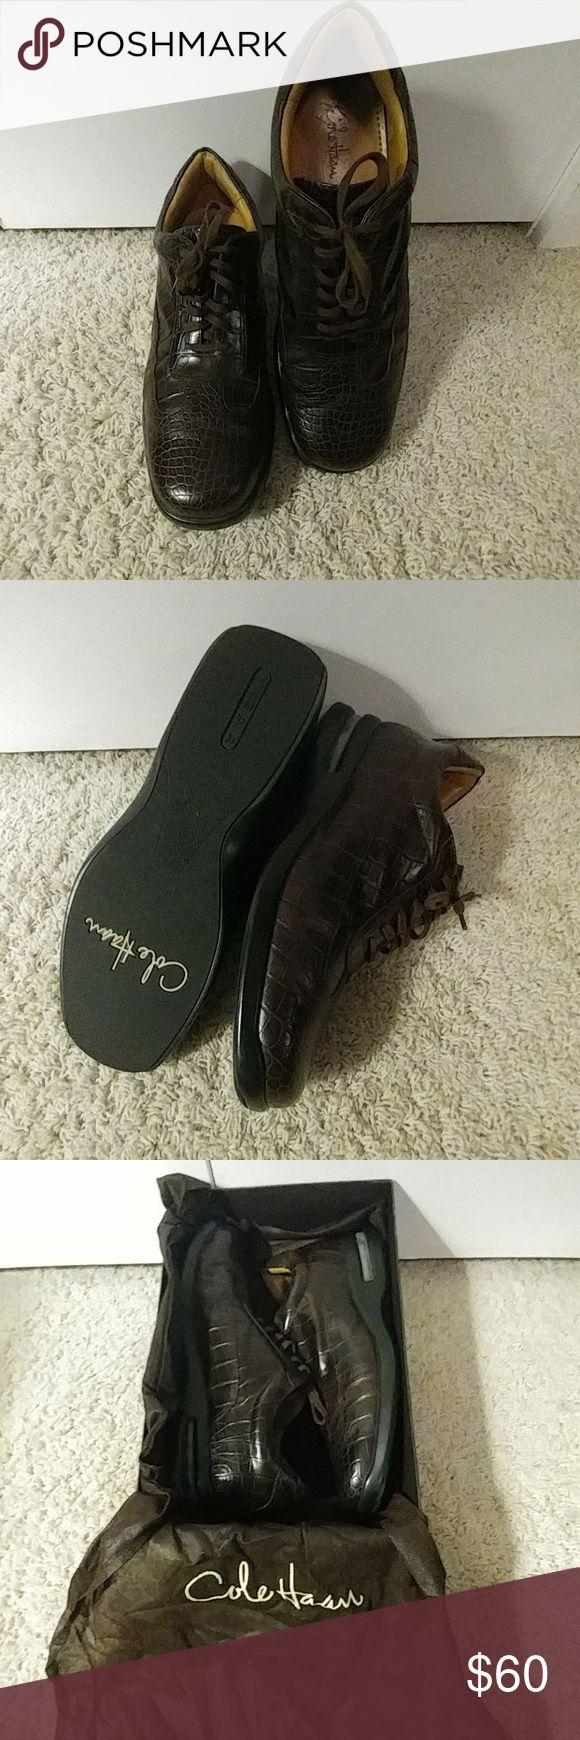 Cole Hann Crocodile Skin Shoes Shoes